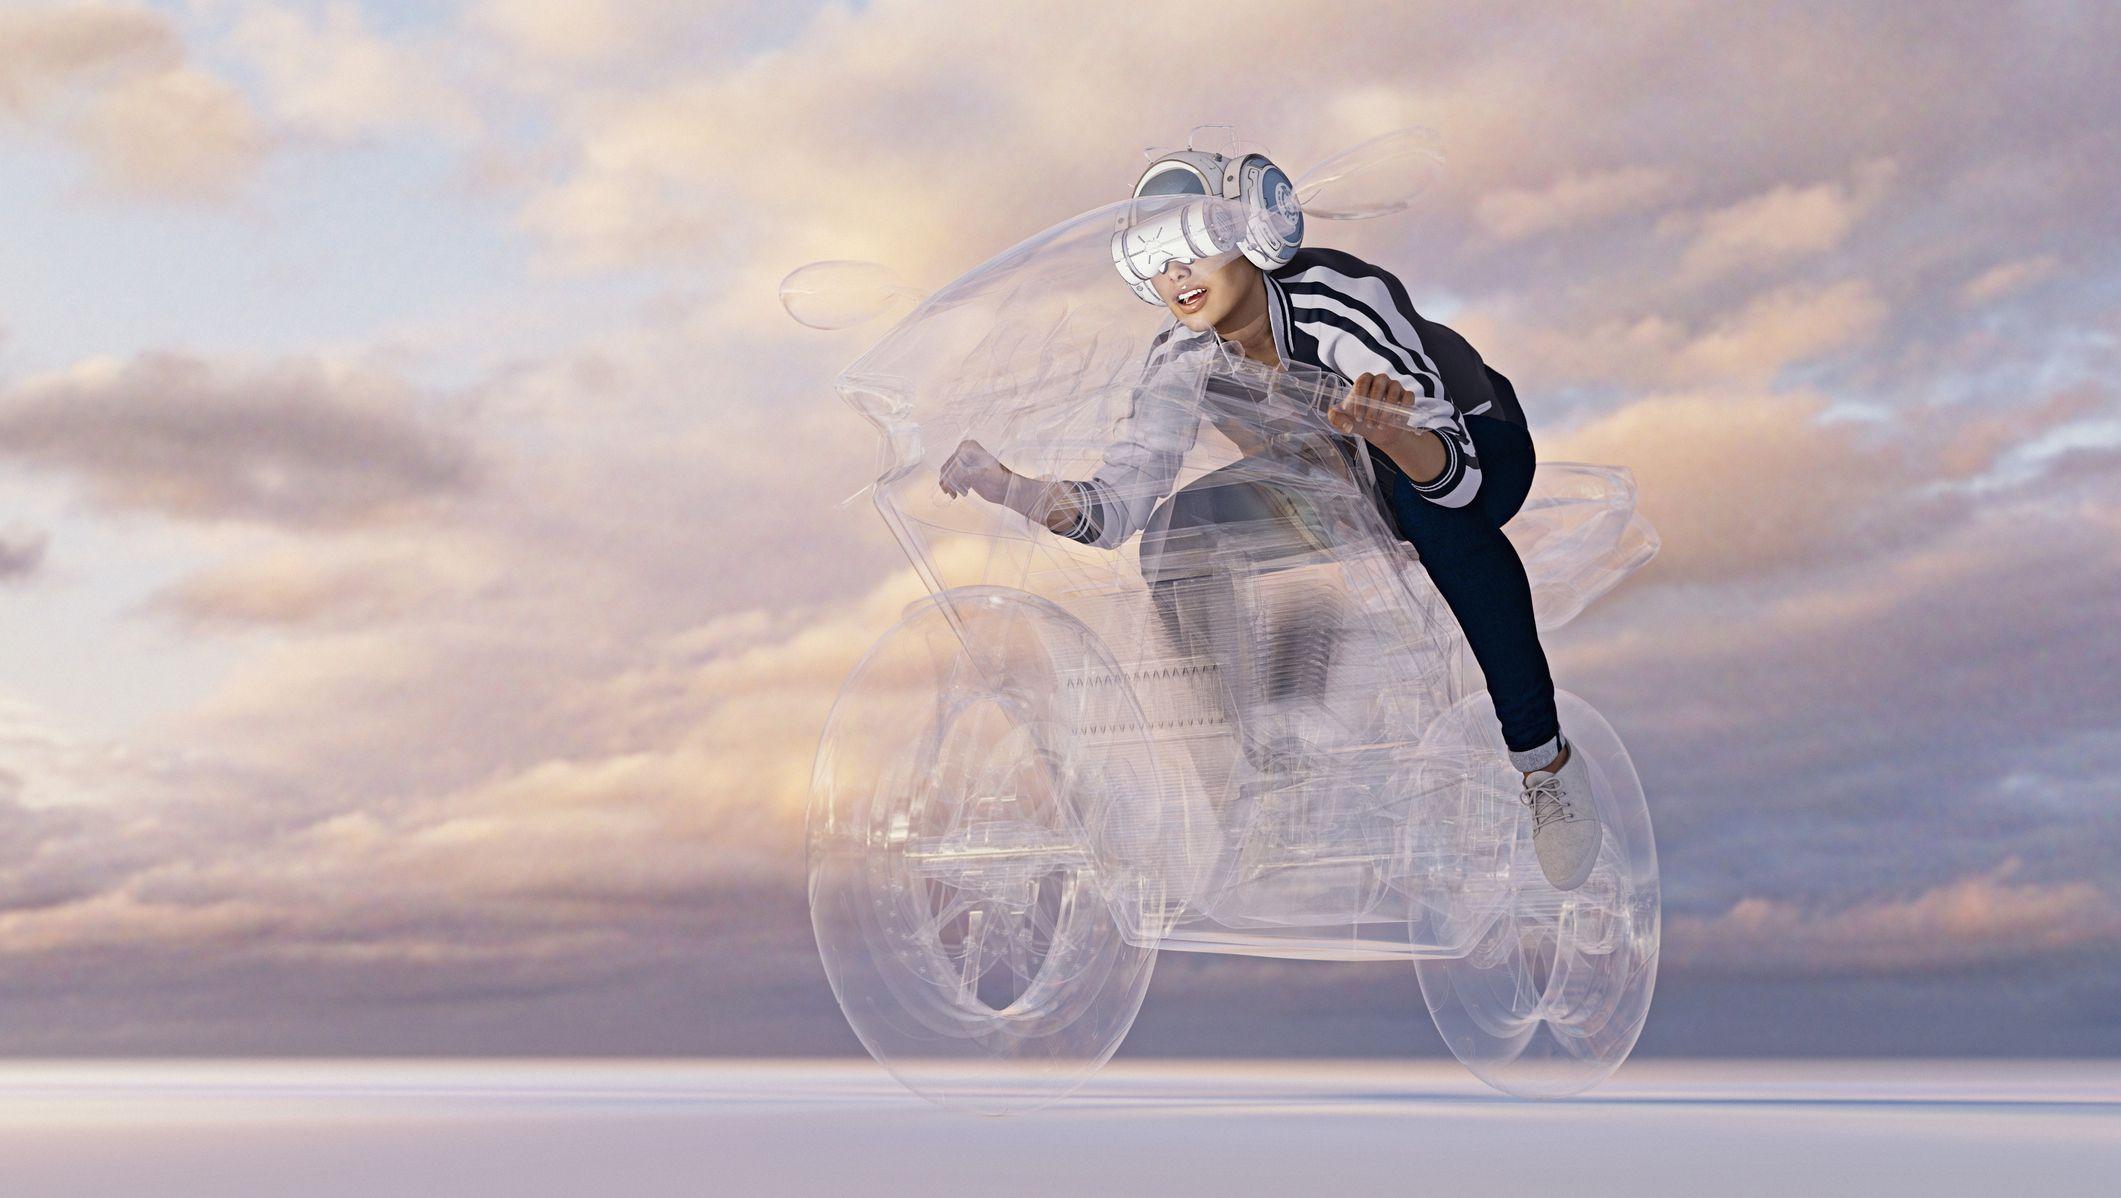 Woman wearing virtual reality helmet riding motorcycle